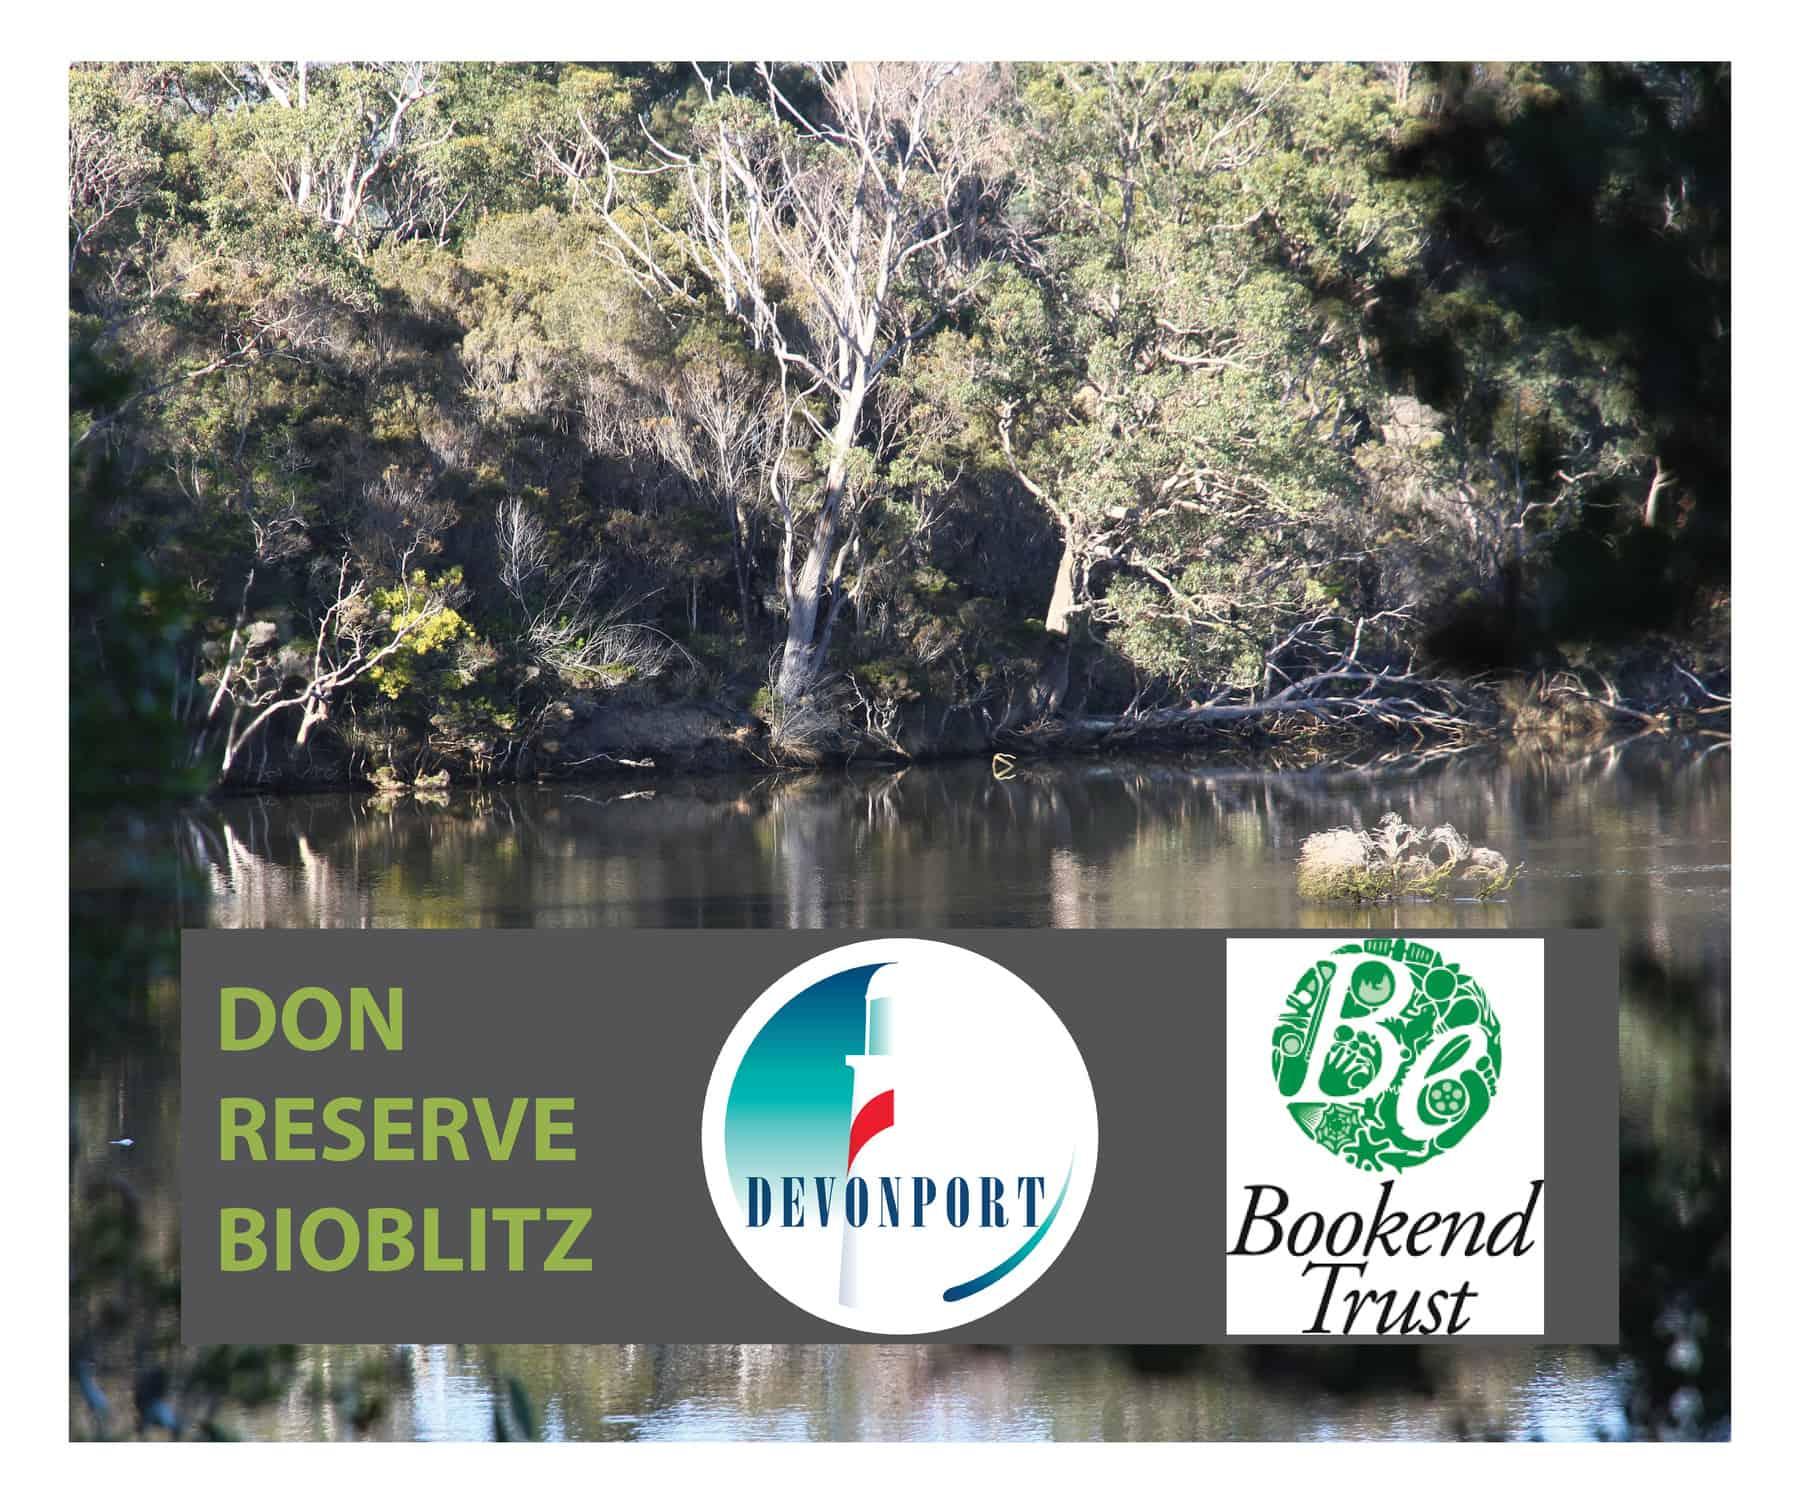 Don Reserve Bio Blitz Social Media Post single image